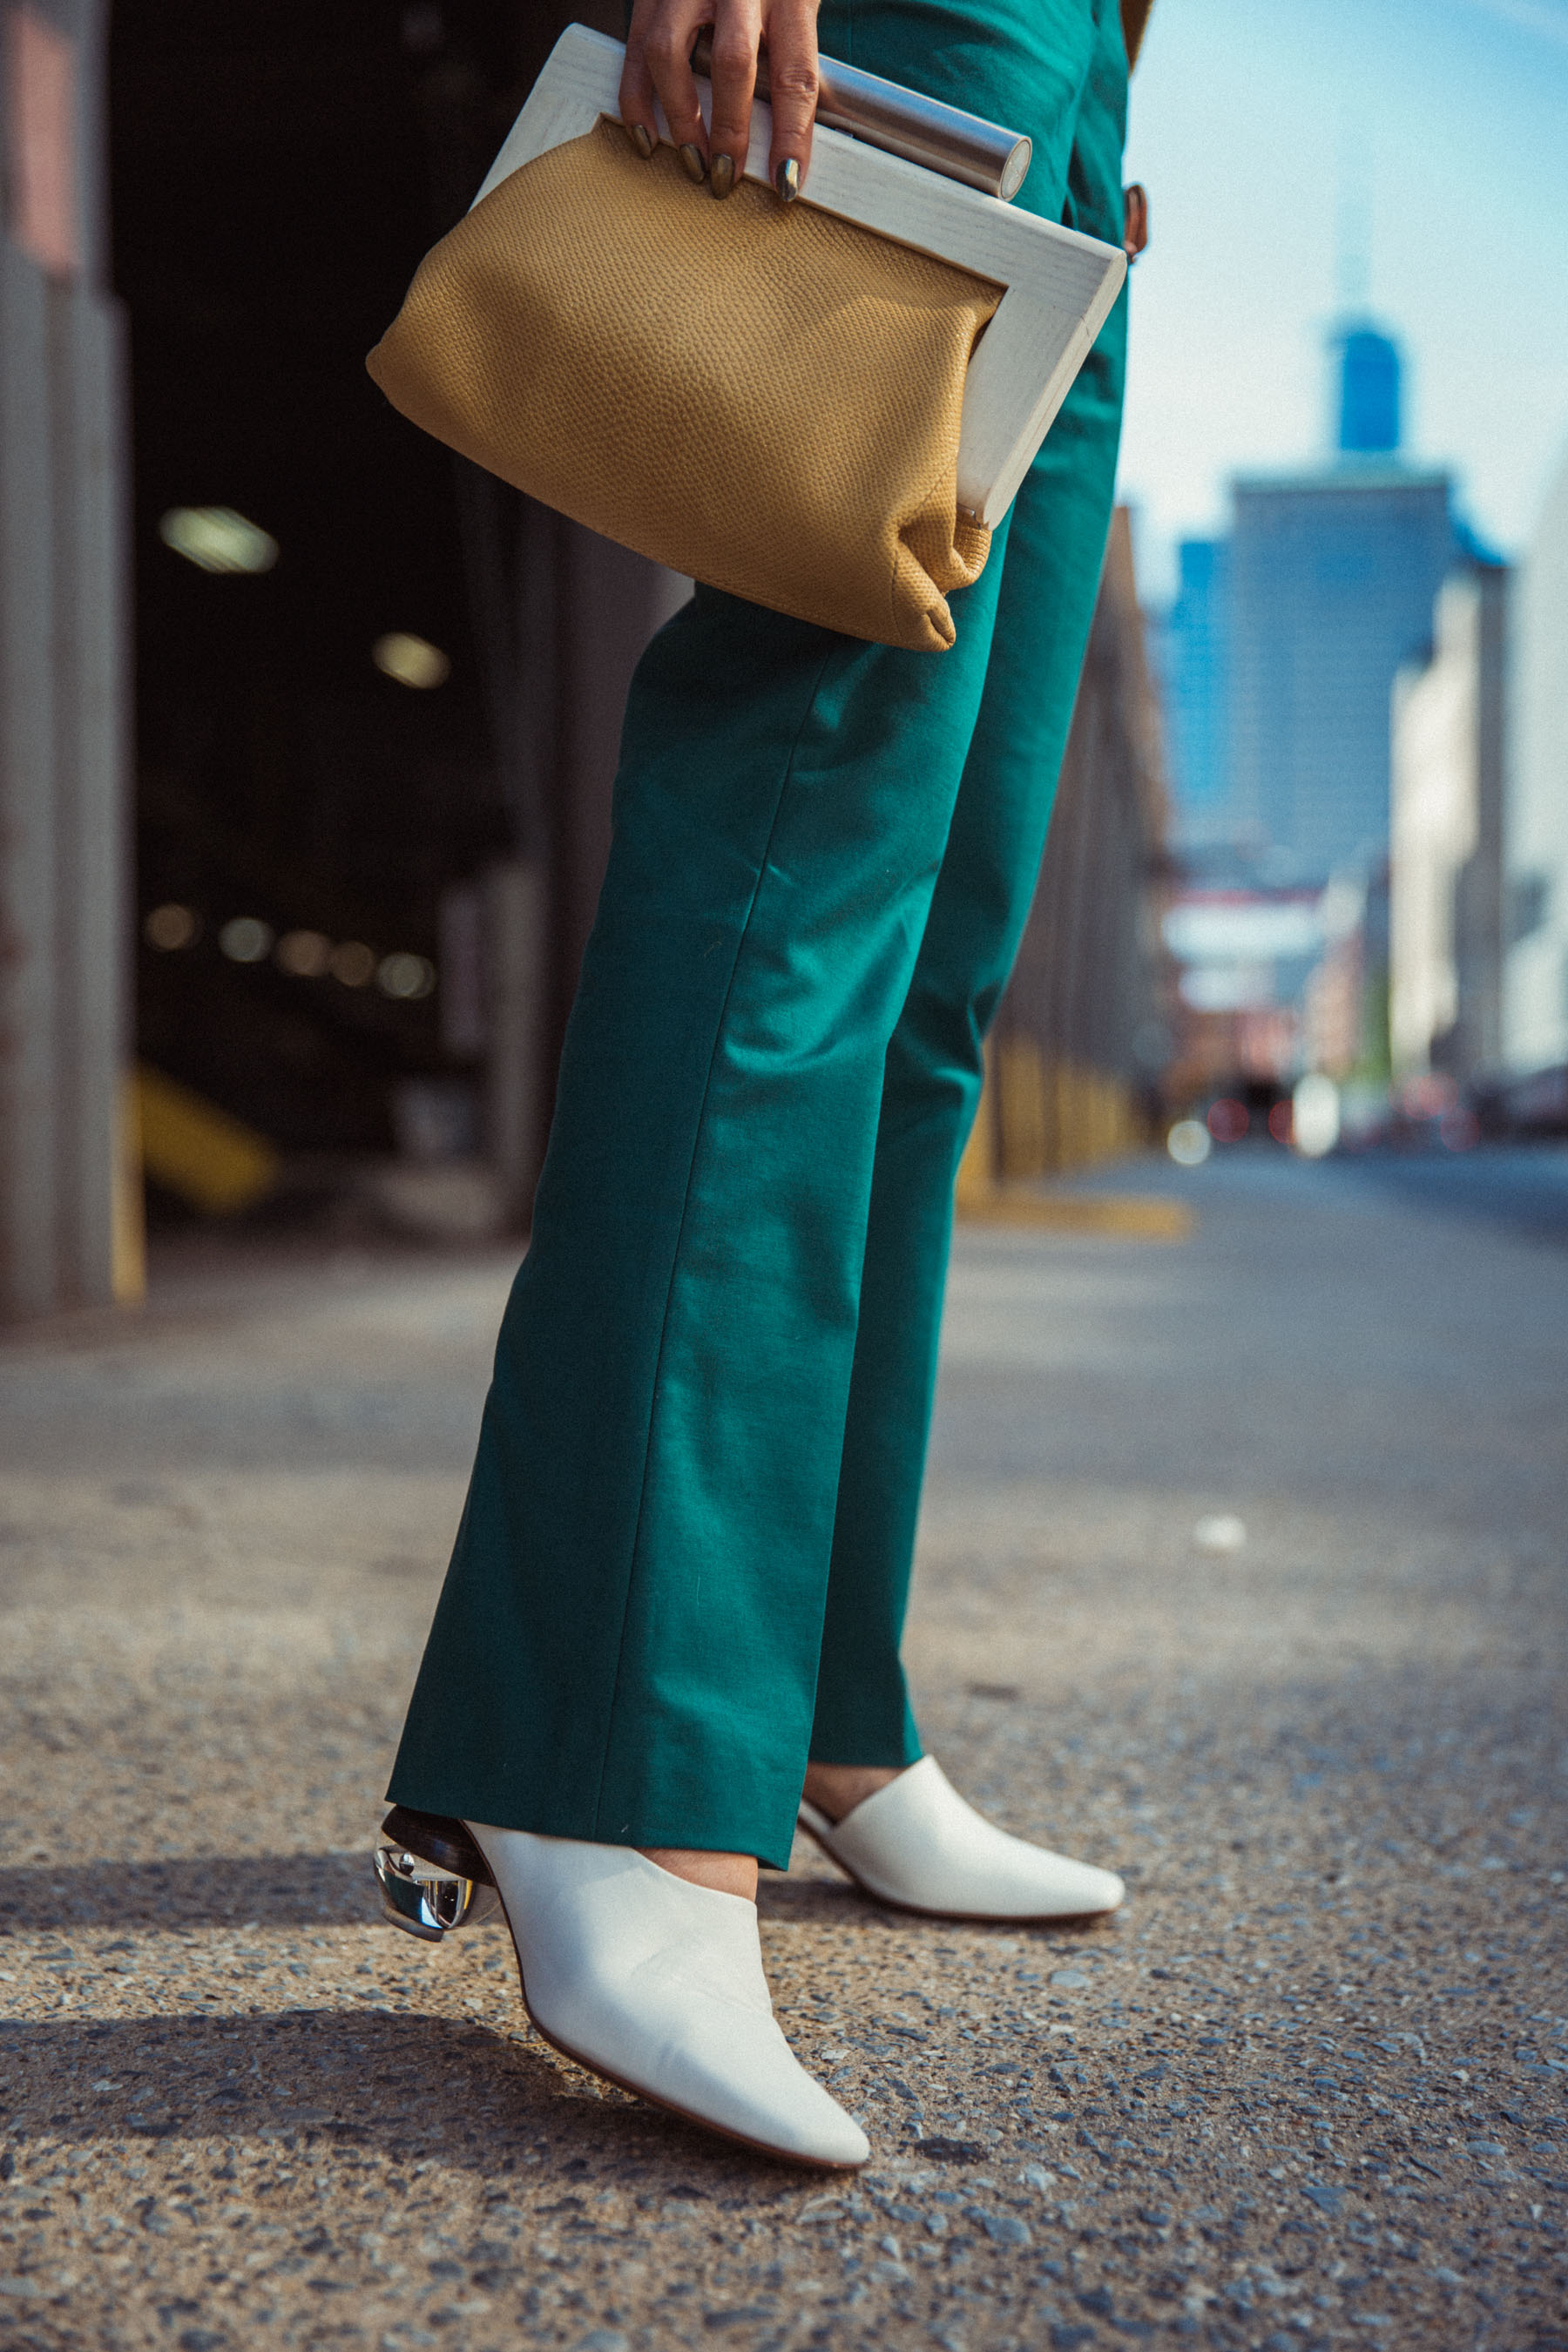 How to Wear Kitten Heels - Zara red kitten heel boots, whit overalls // Notjessfashion.com